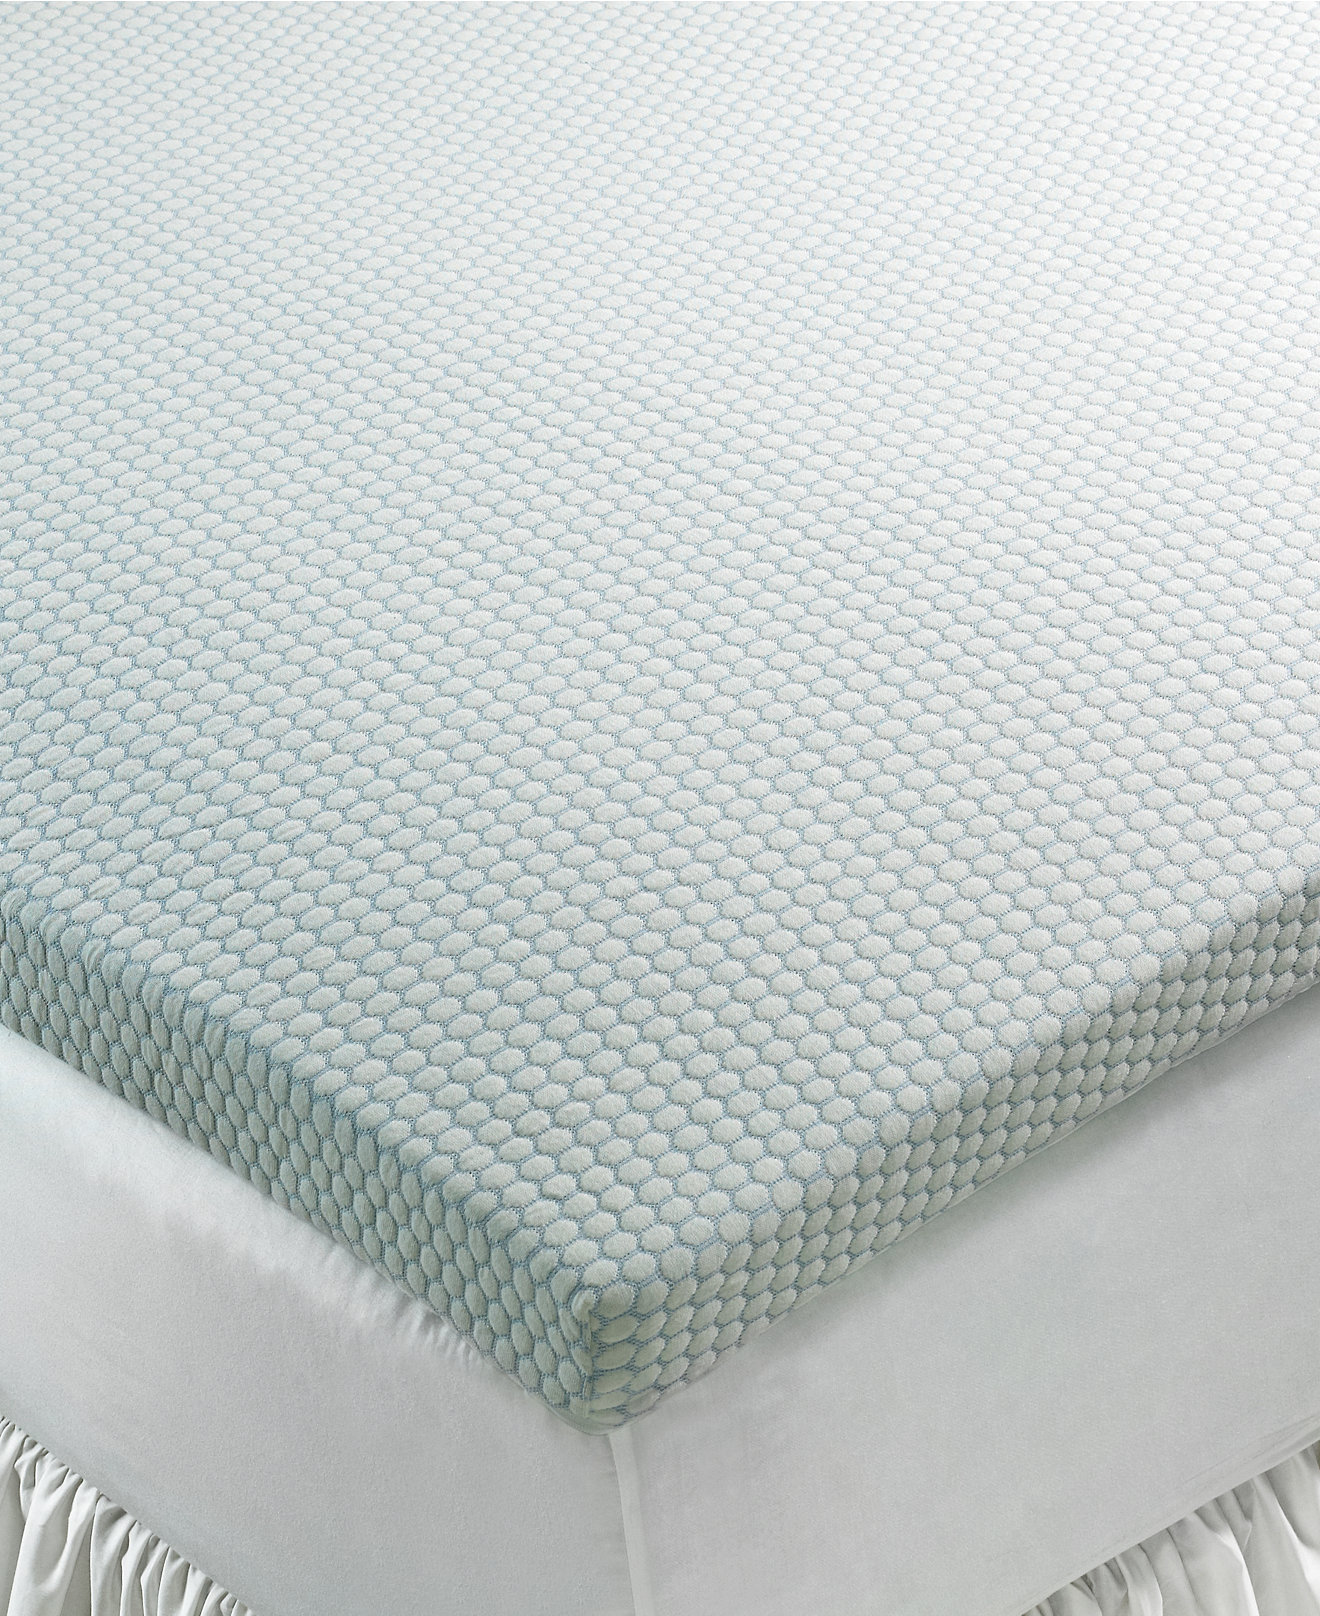 home design 5 zone memory foam